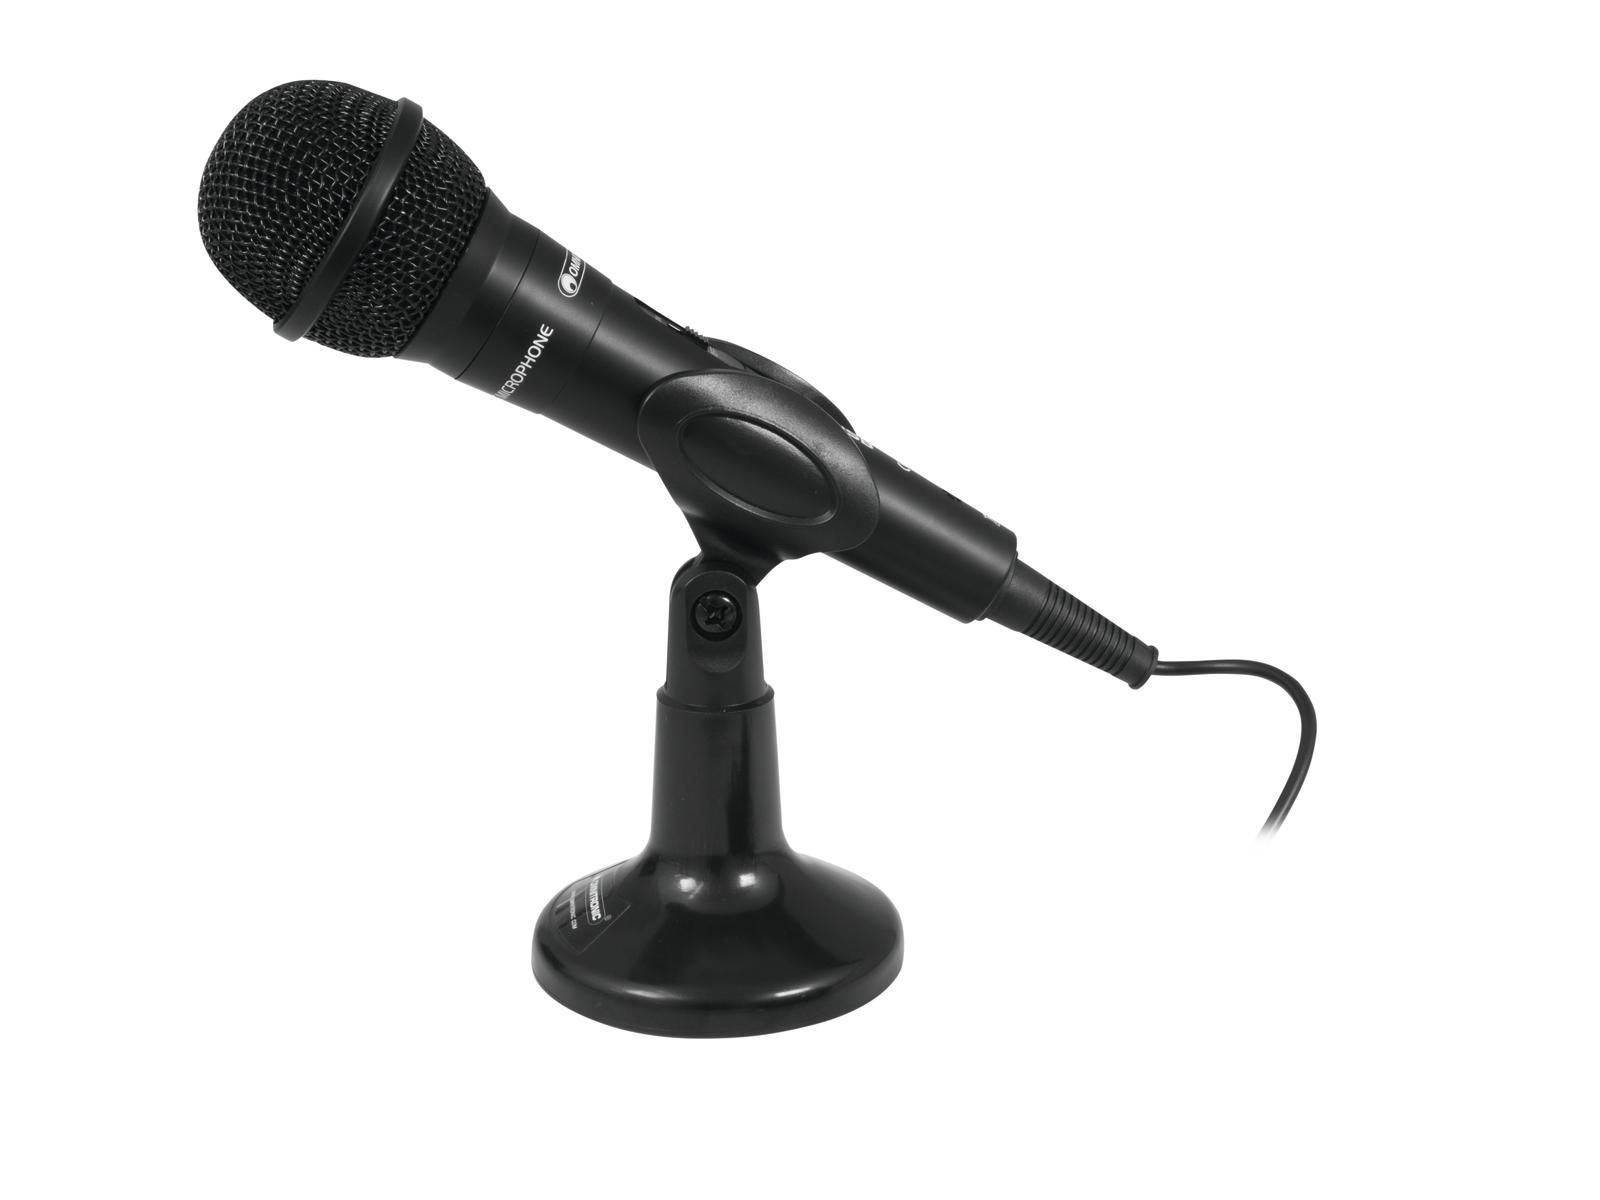 Omnitronic M-22 USB Dynamisk Mikrofon